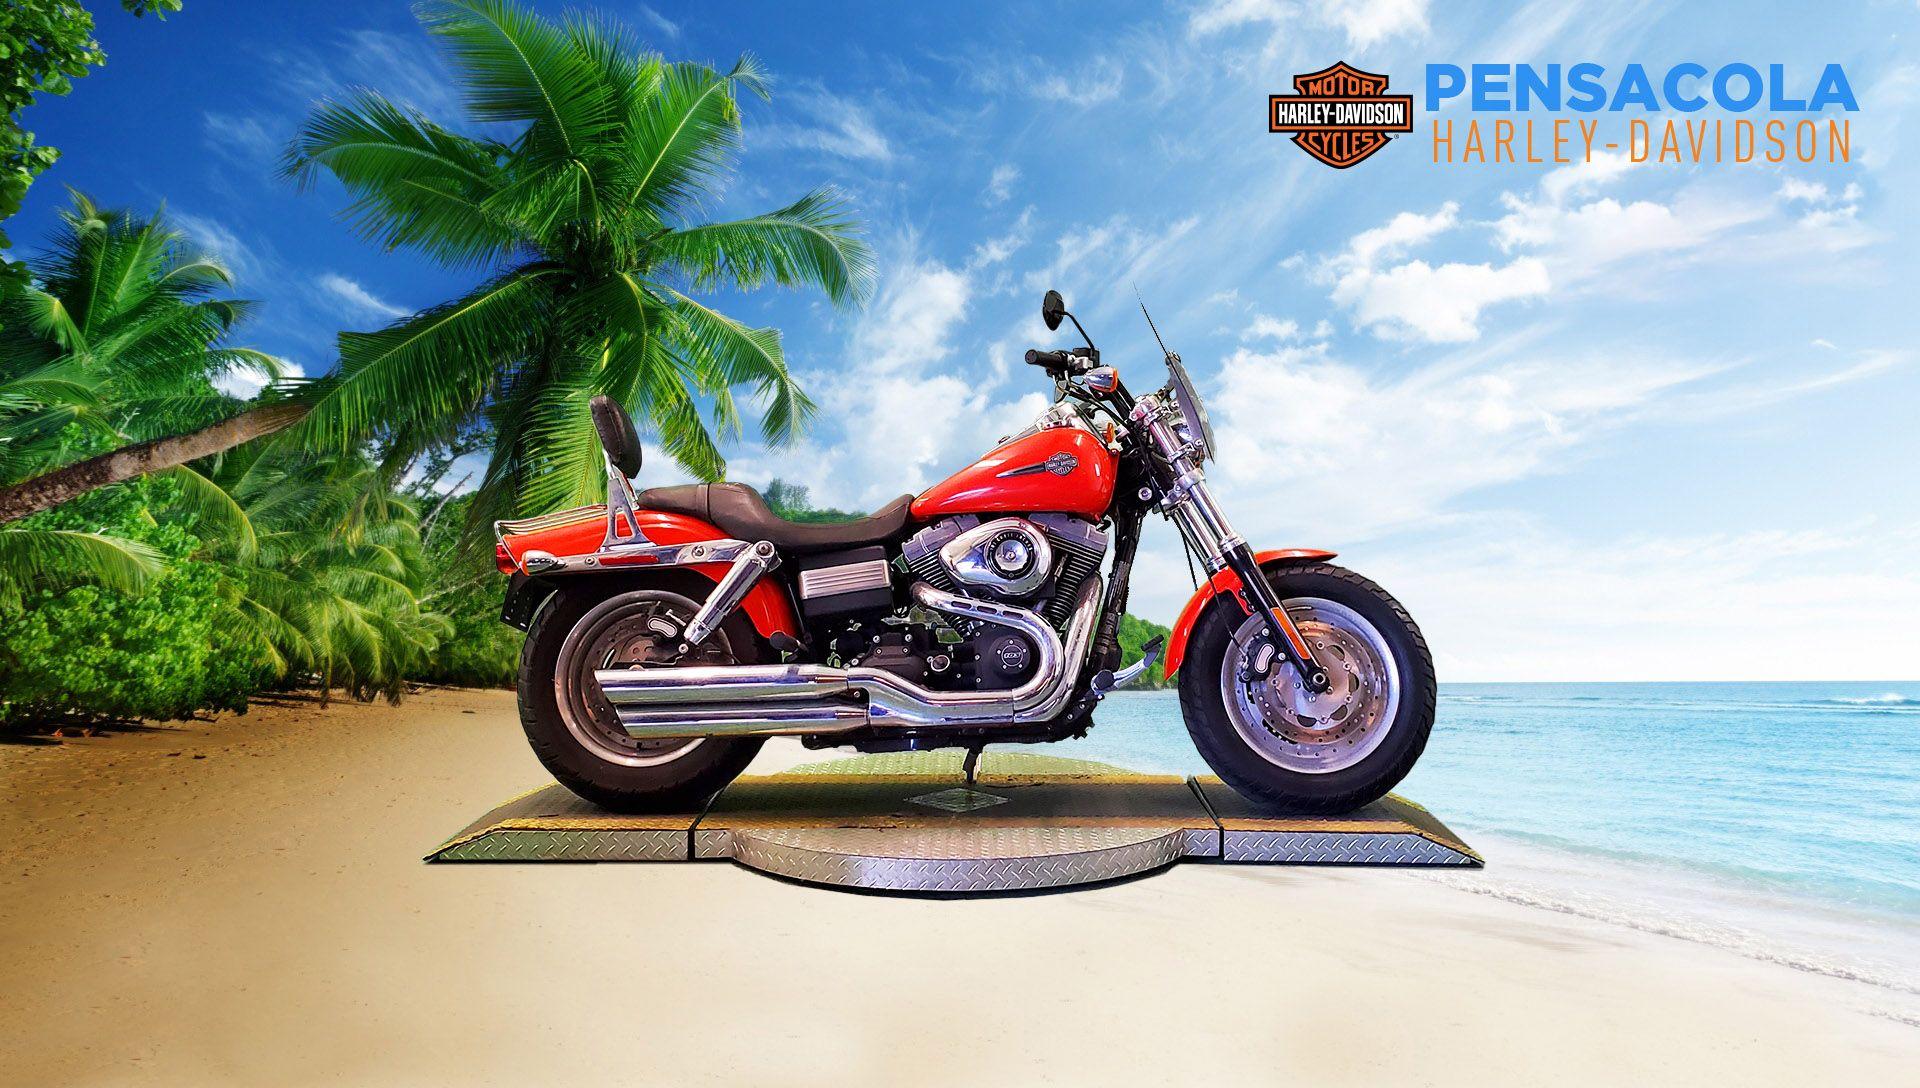 Pre-Owned 2012 Harley-Davidson Fat Bob FXDF